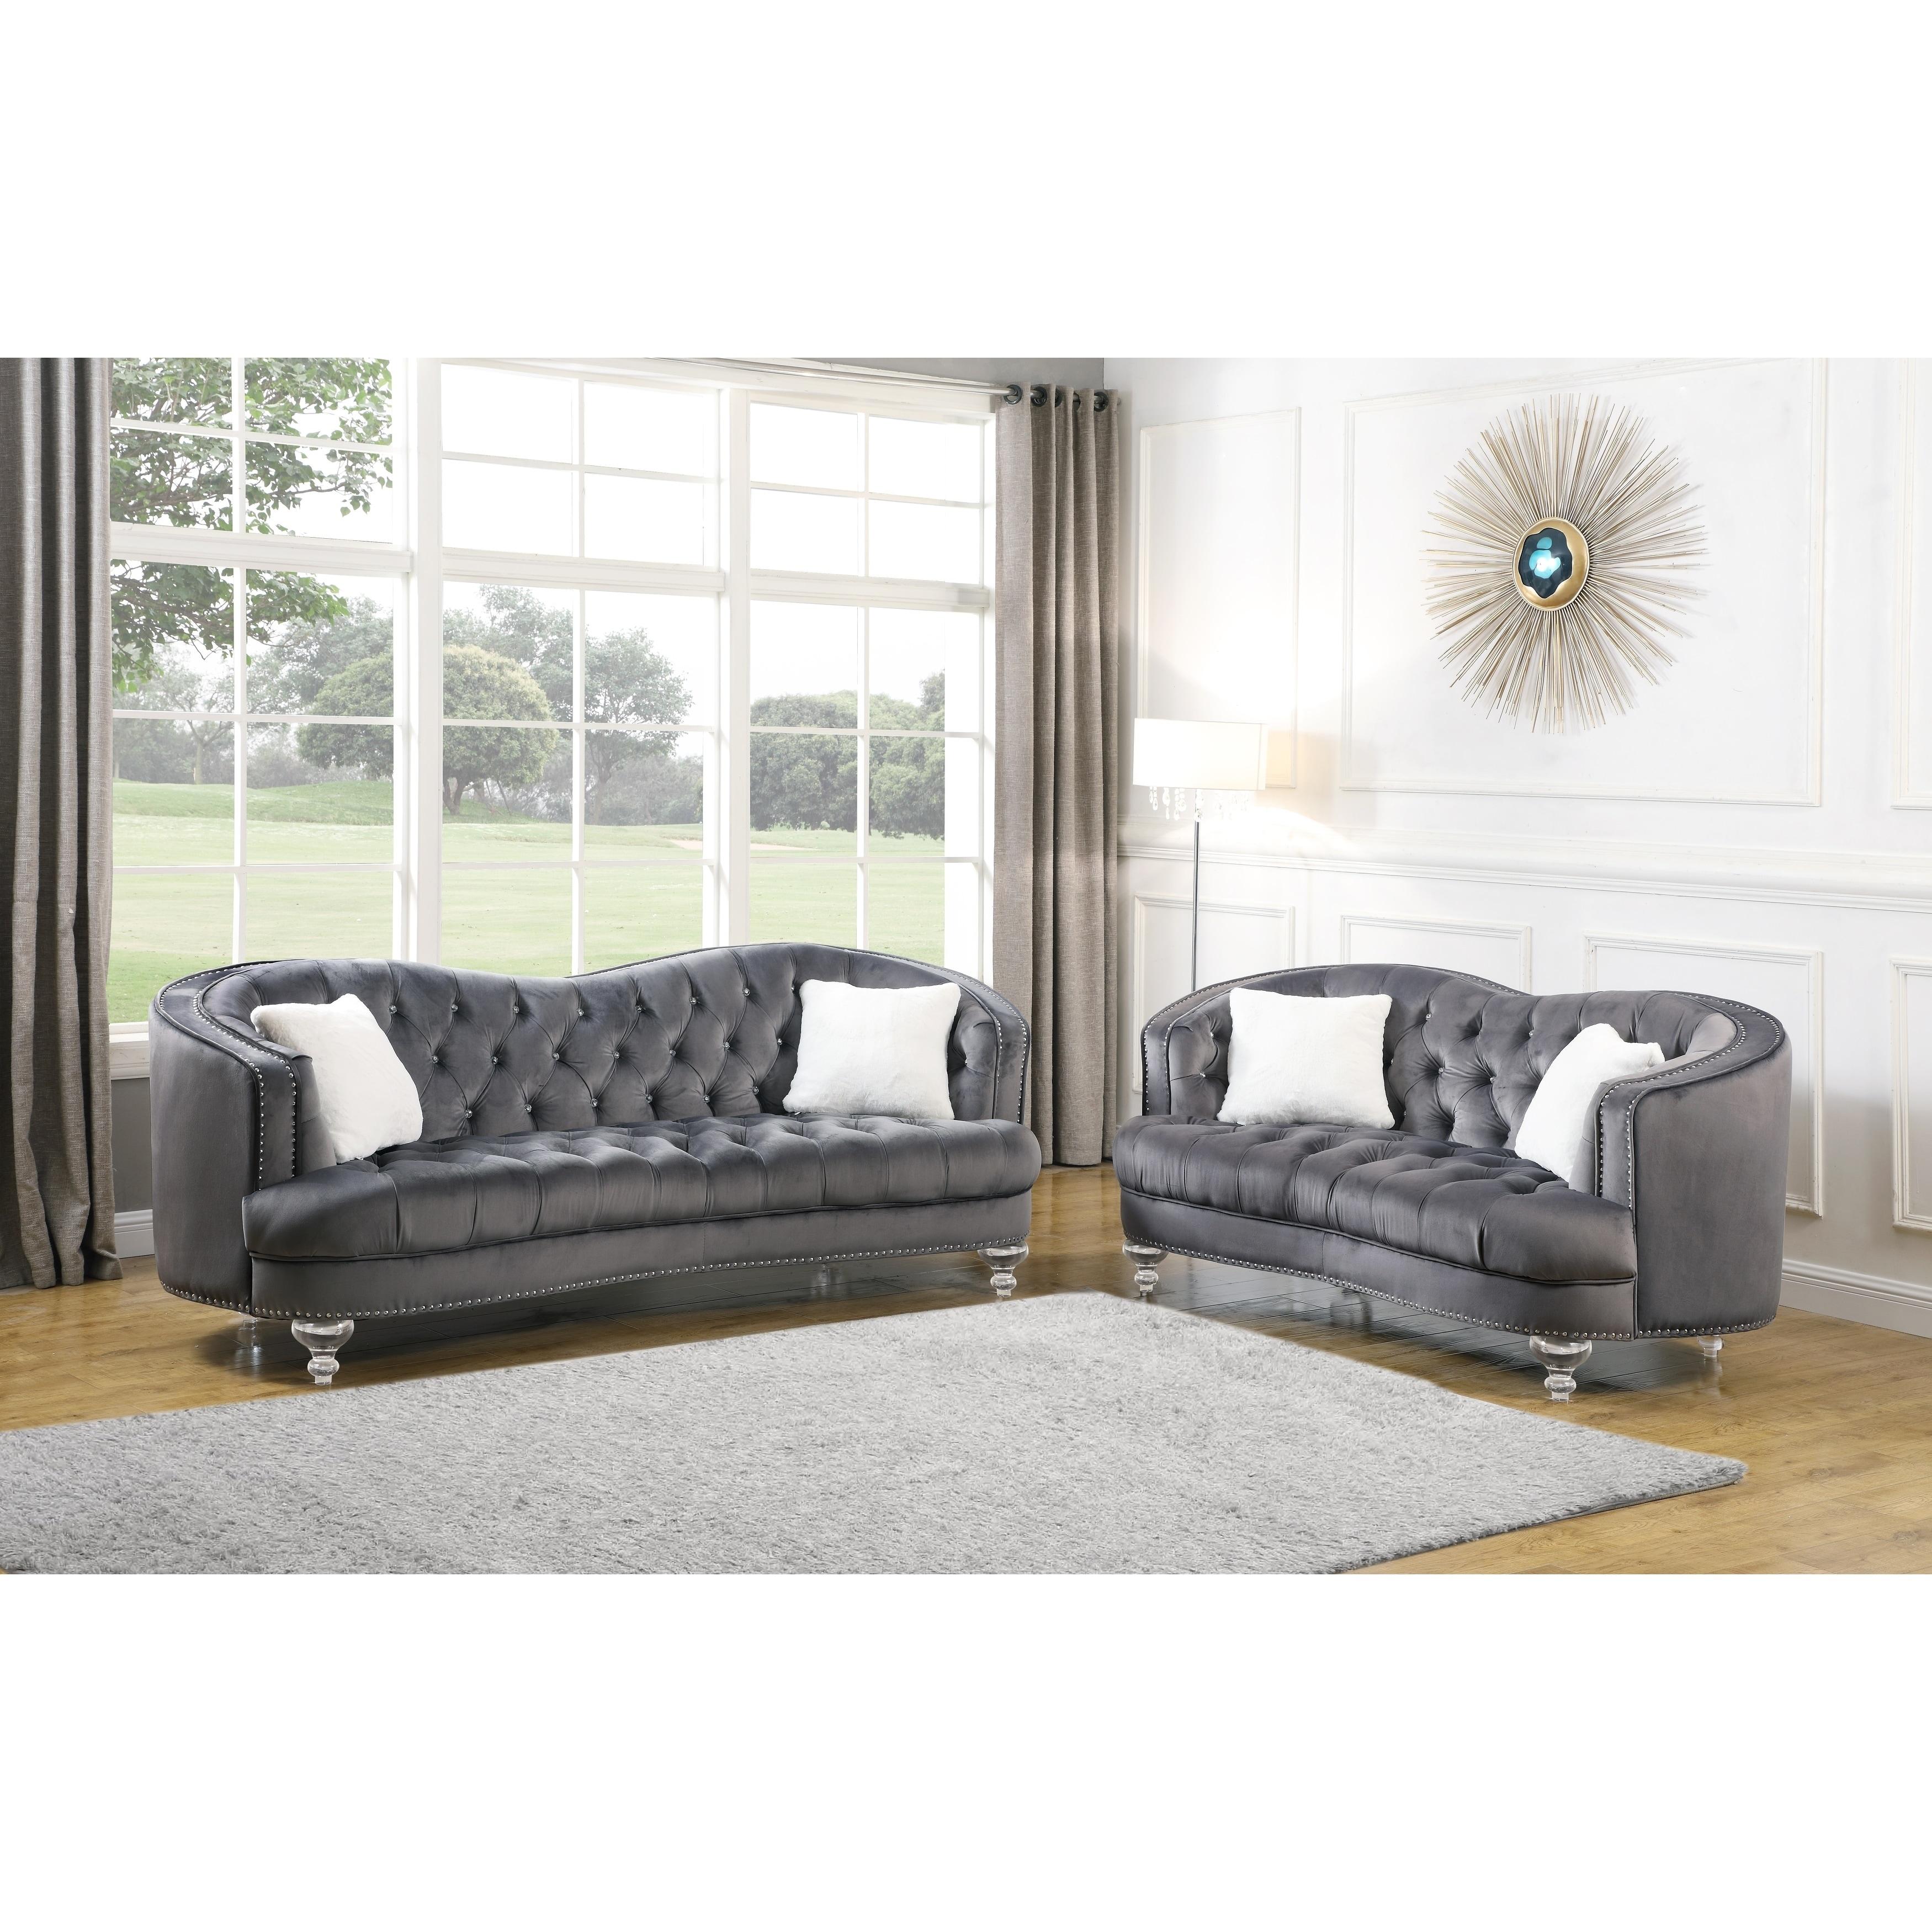 Best Quality Furniture 2-piece Velvet Tufted Sofa And Loveseat Set - On Sale - Overstock - 27017223 - Dark Grey